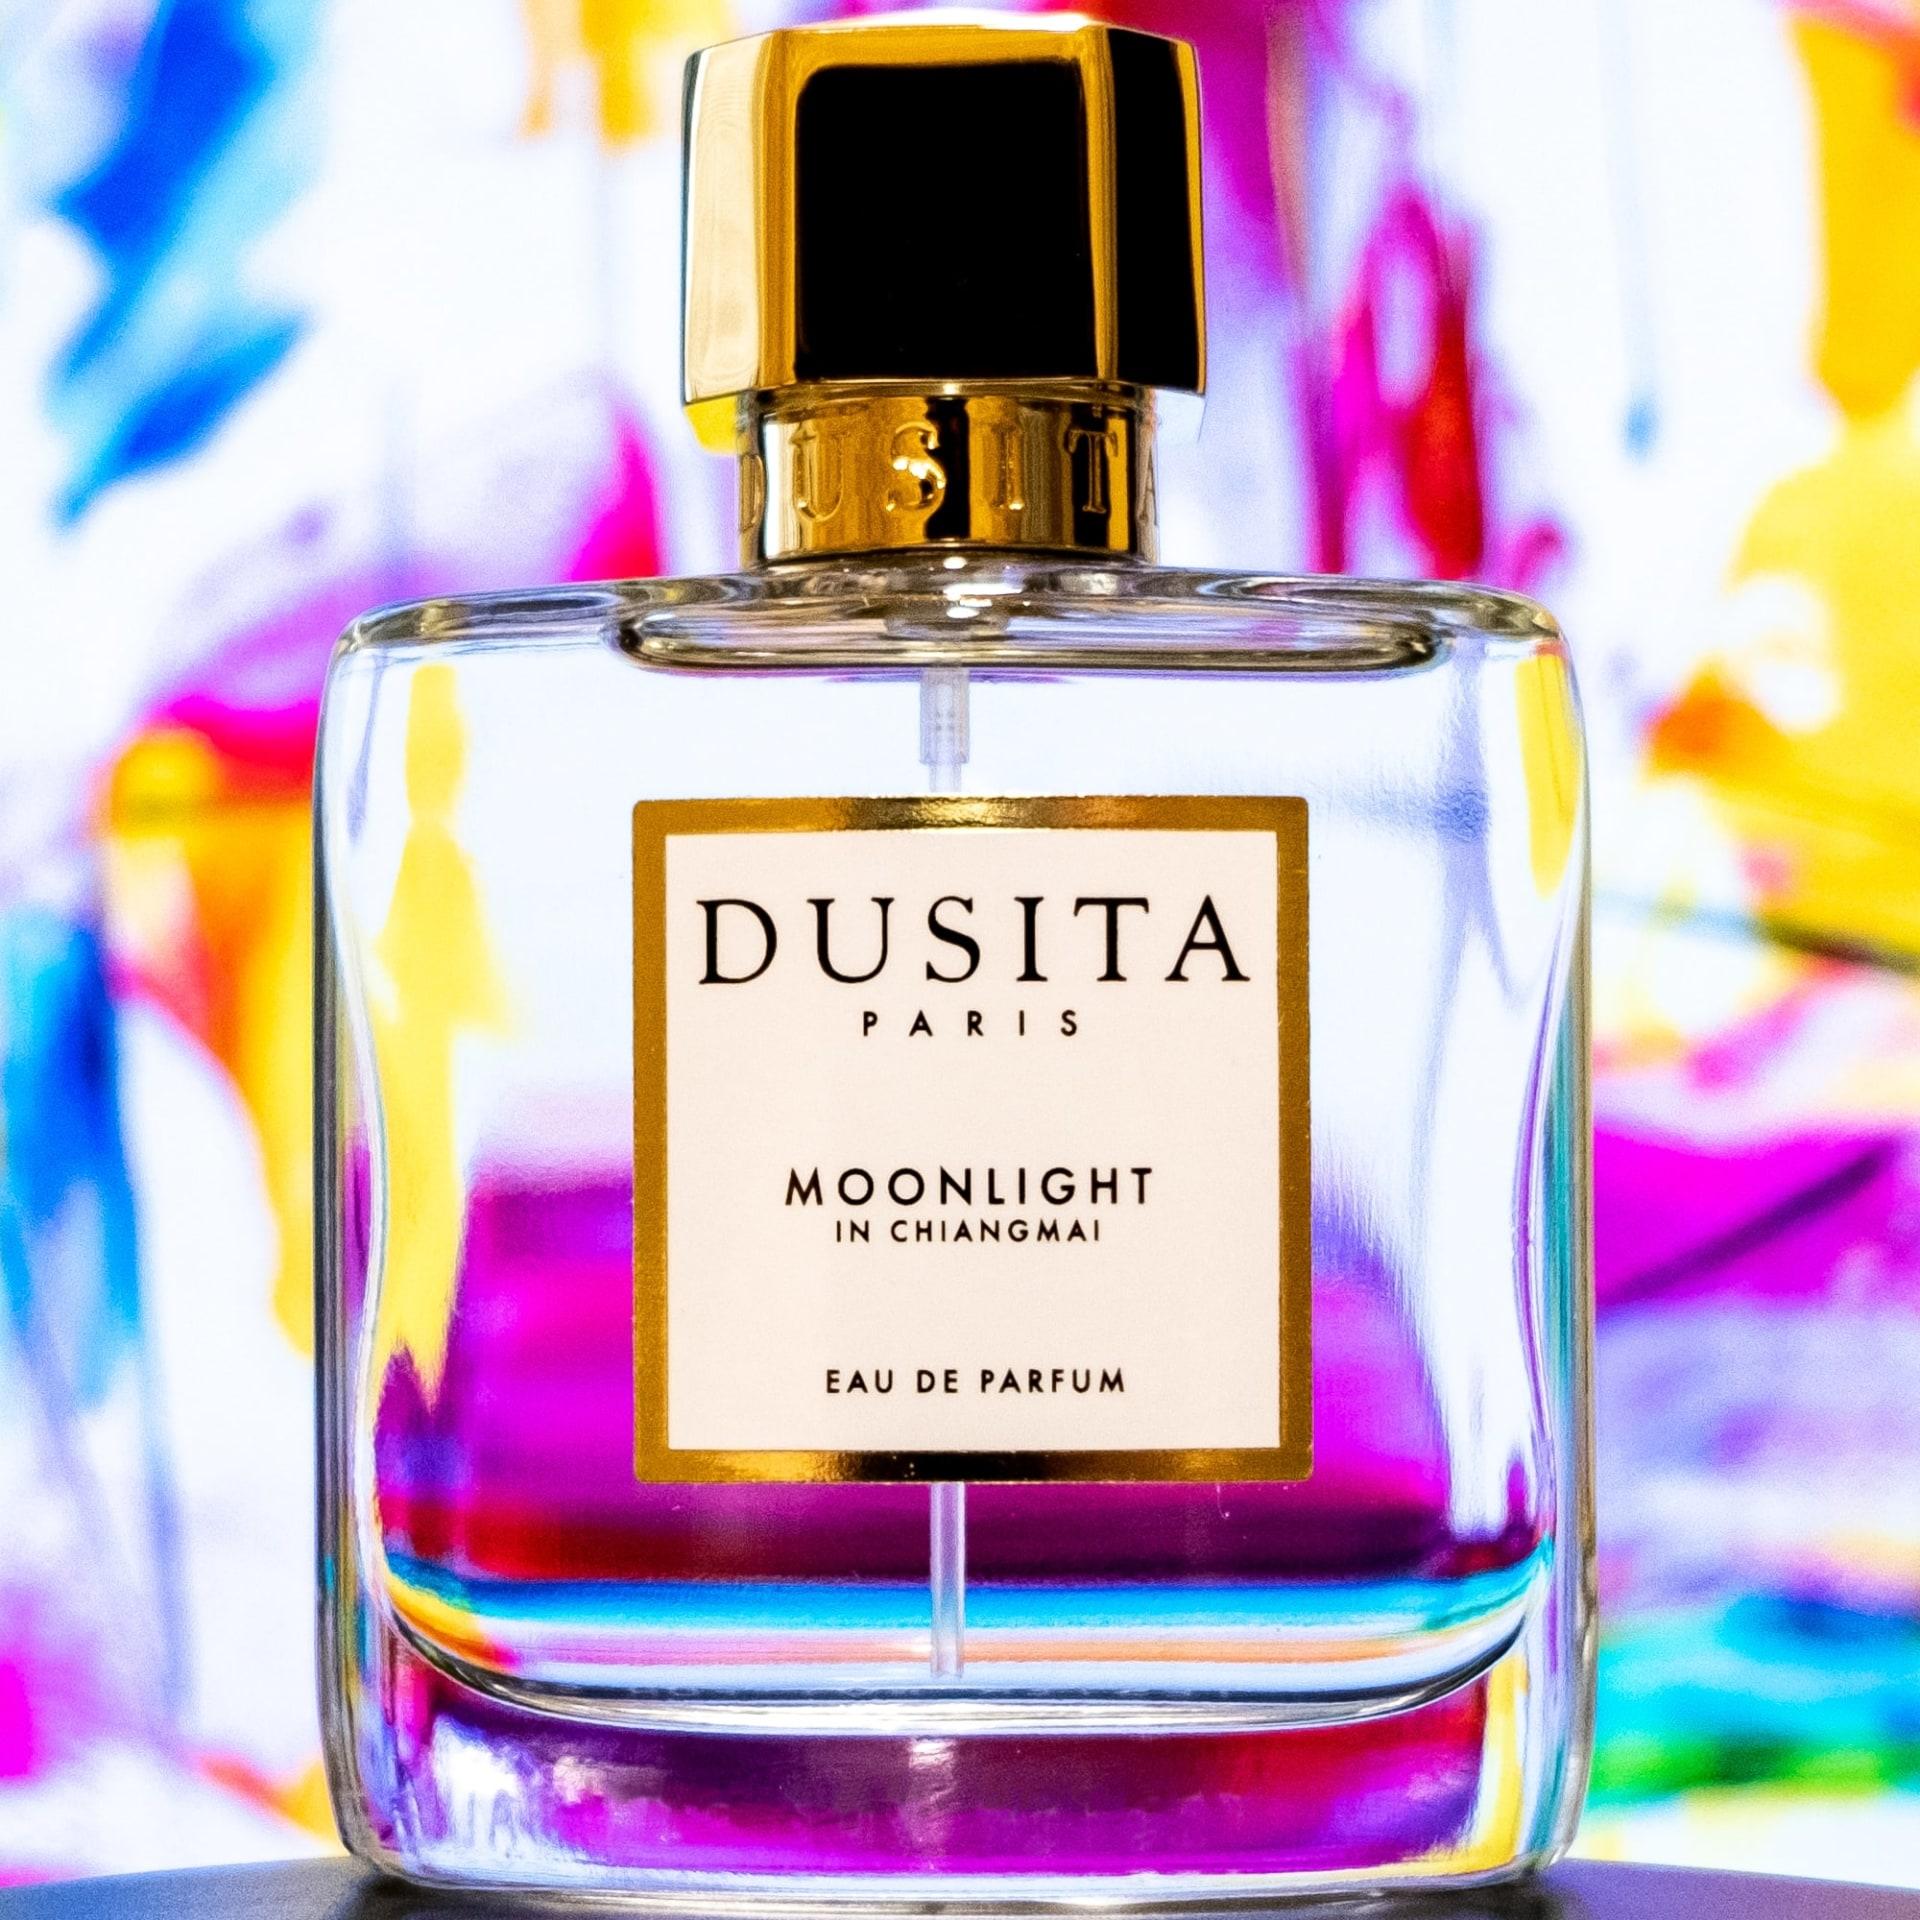 parfums-dusita-moonlight-in-chiangmai